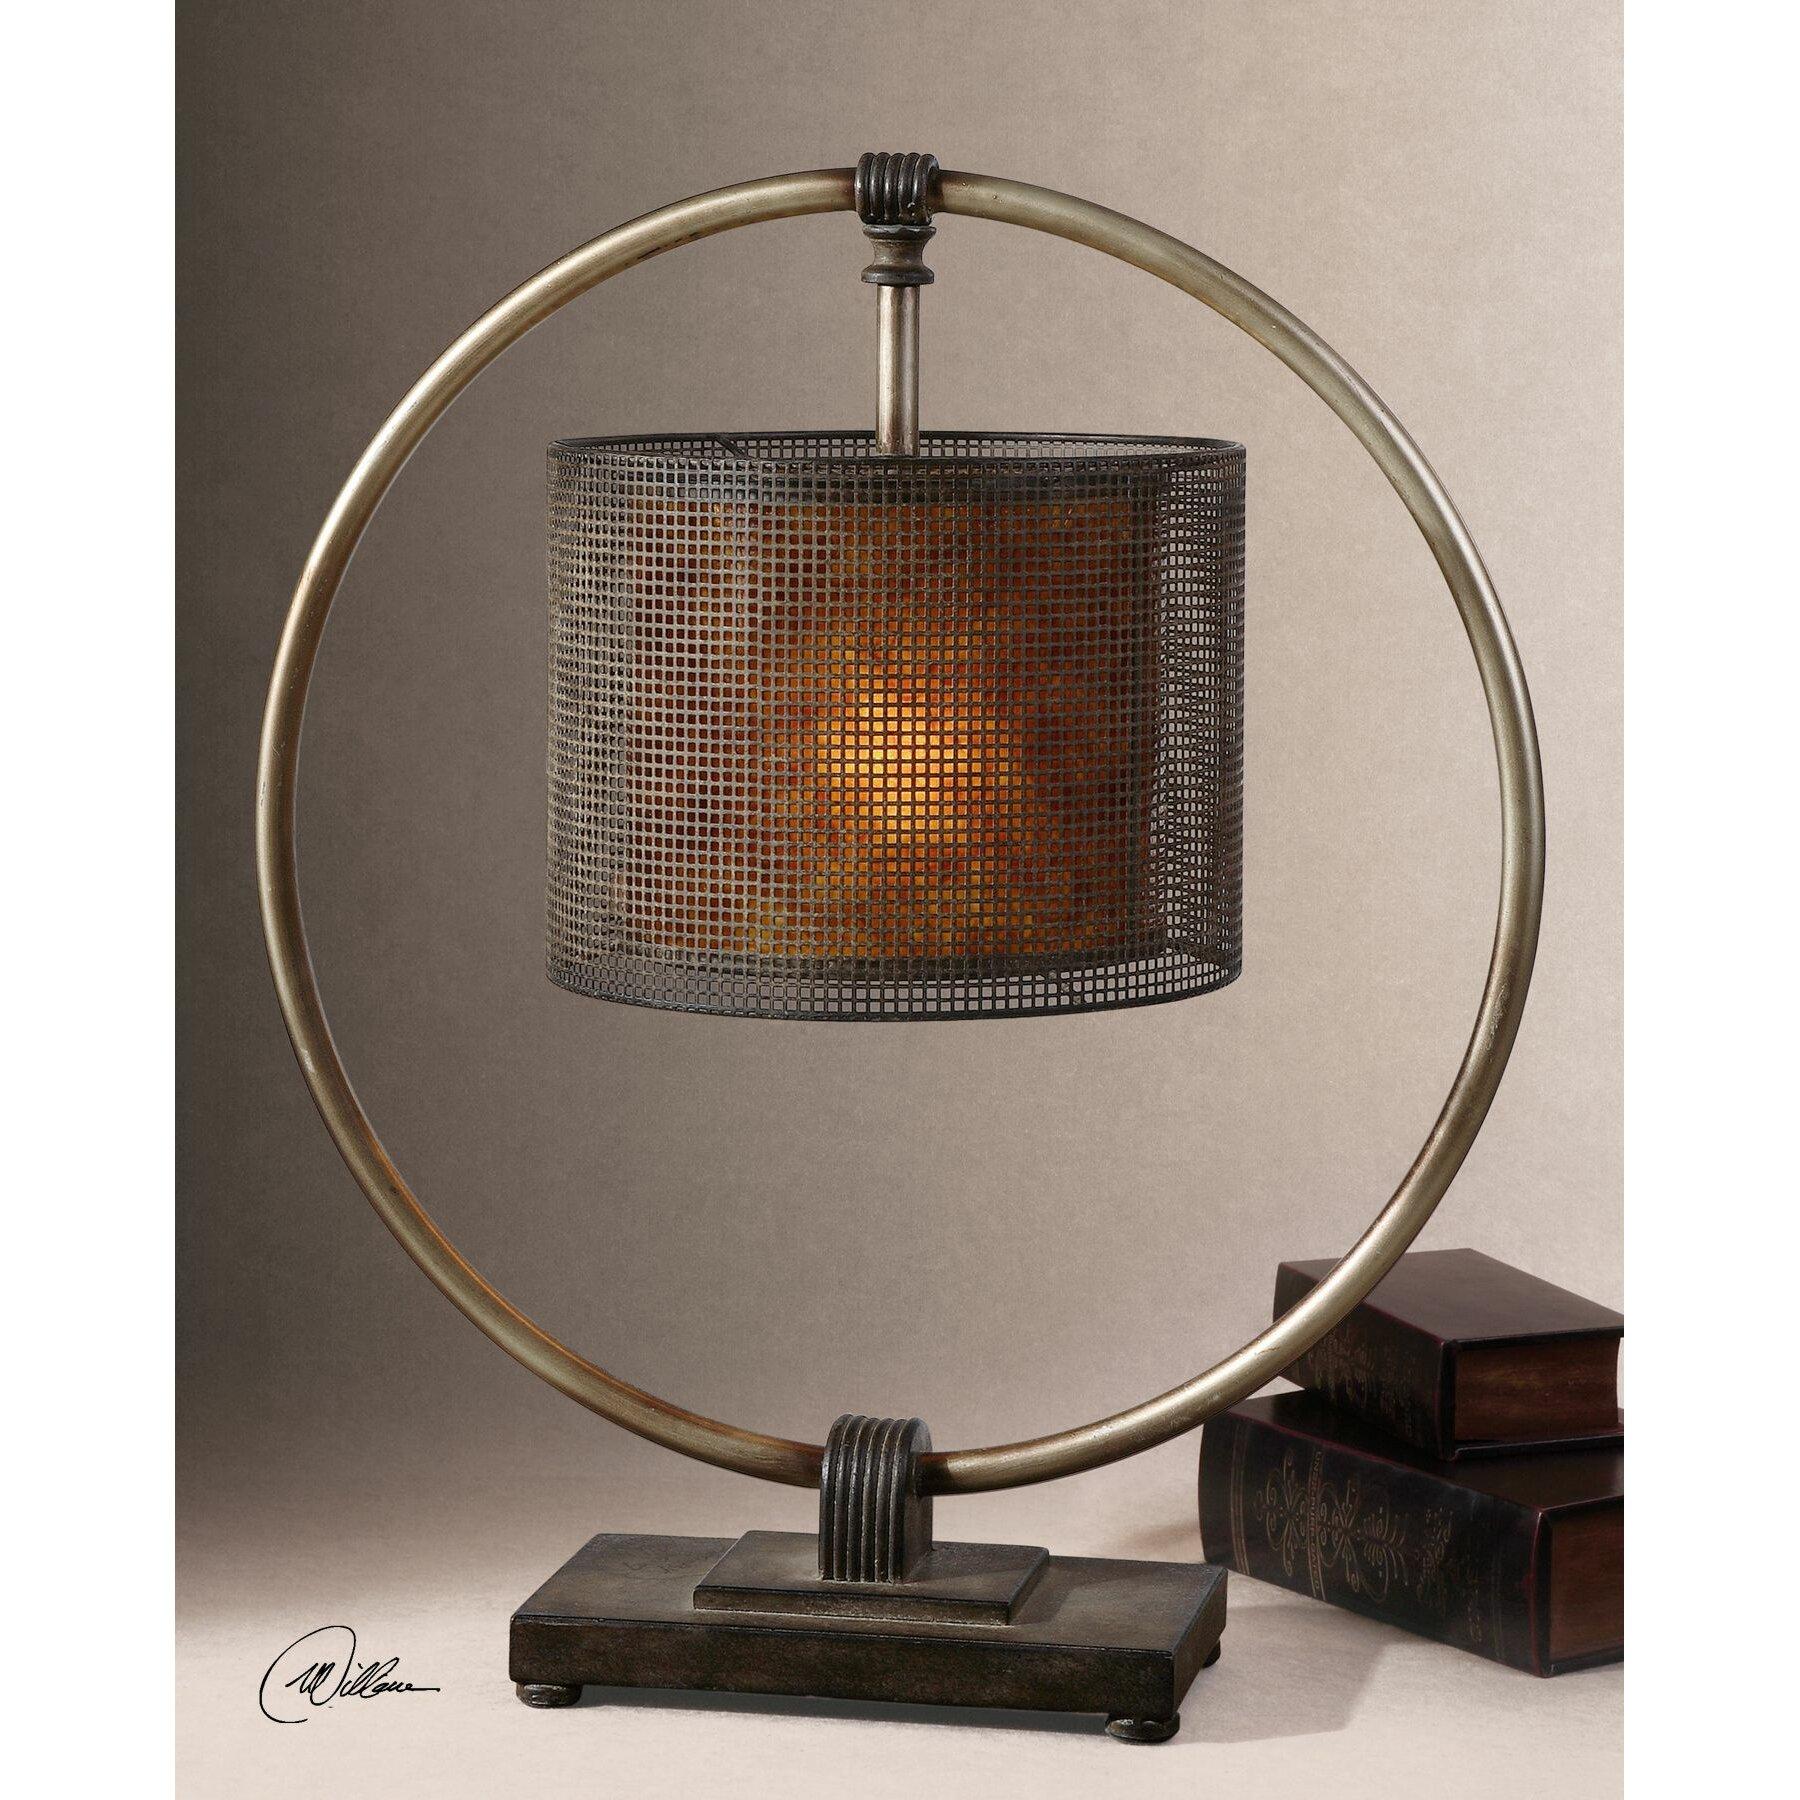 uttermost dalou 28 table lamp reviews wayfair. Black Bedroom Furniture Sets. Home Design Ideas